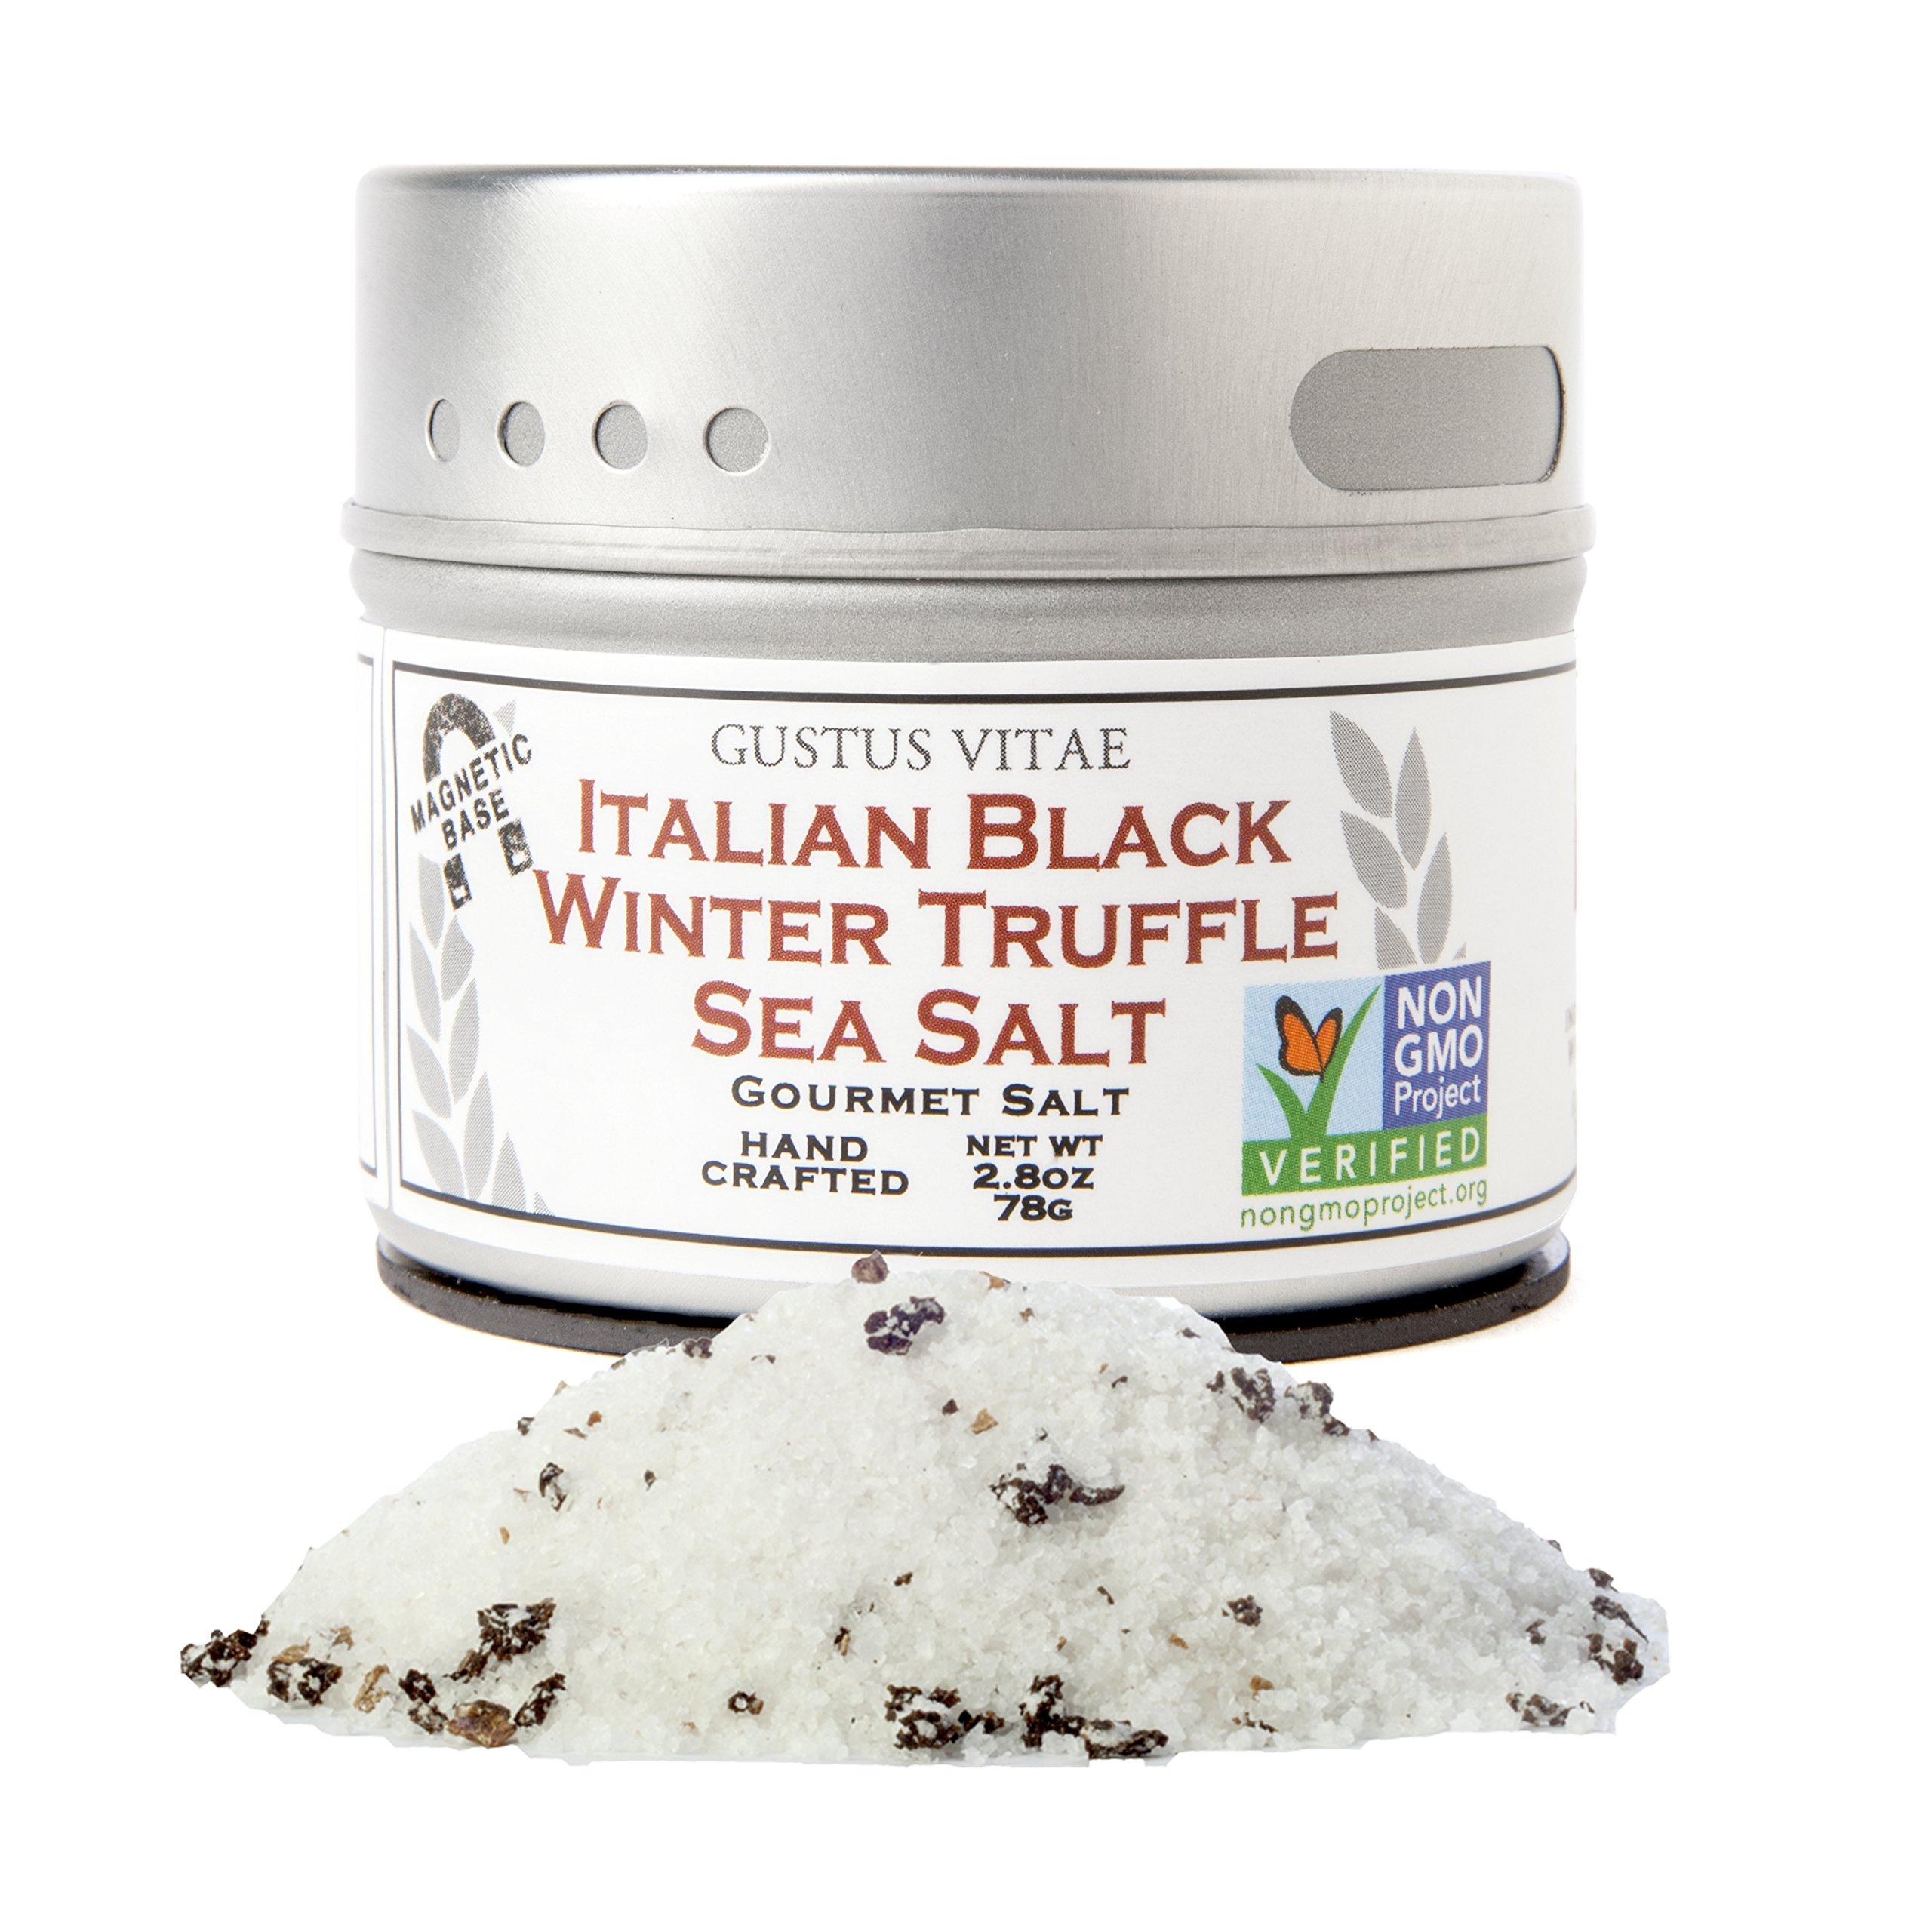 Italian Black Winter Truffle Sea Salt | Non GMO Verified | Small Batch Gourmet Seasoning